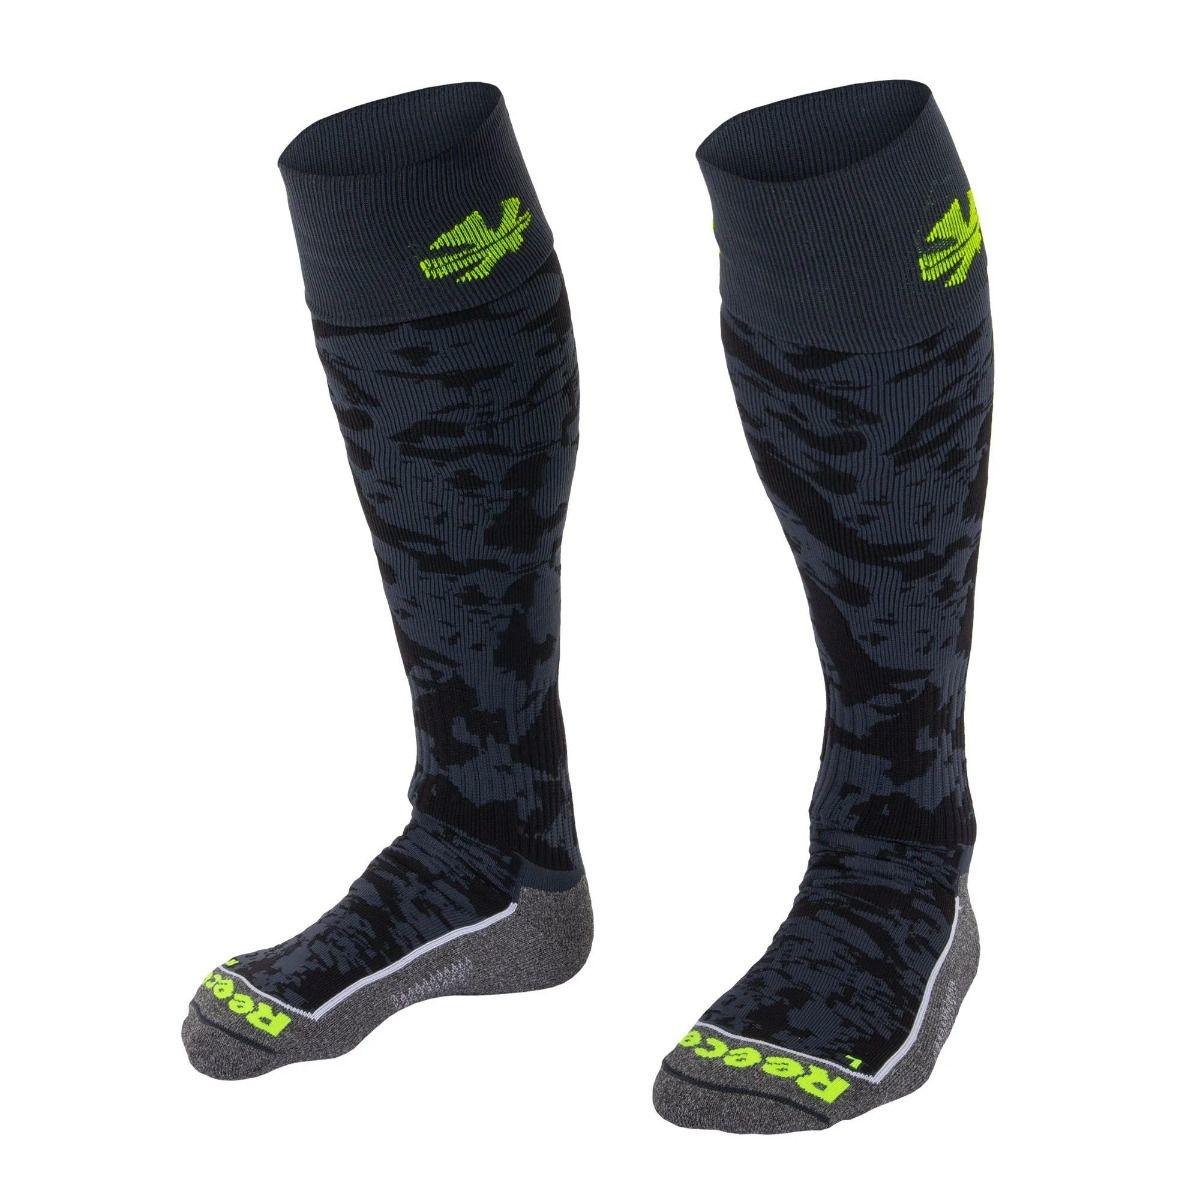 Reece Reece Oxley sokken zwart